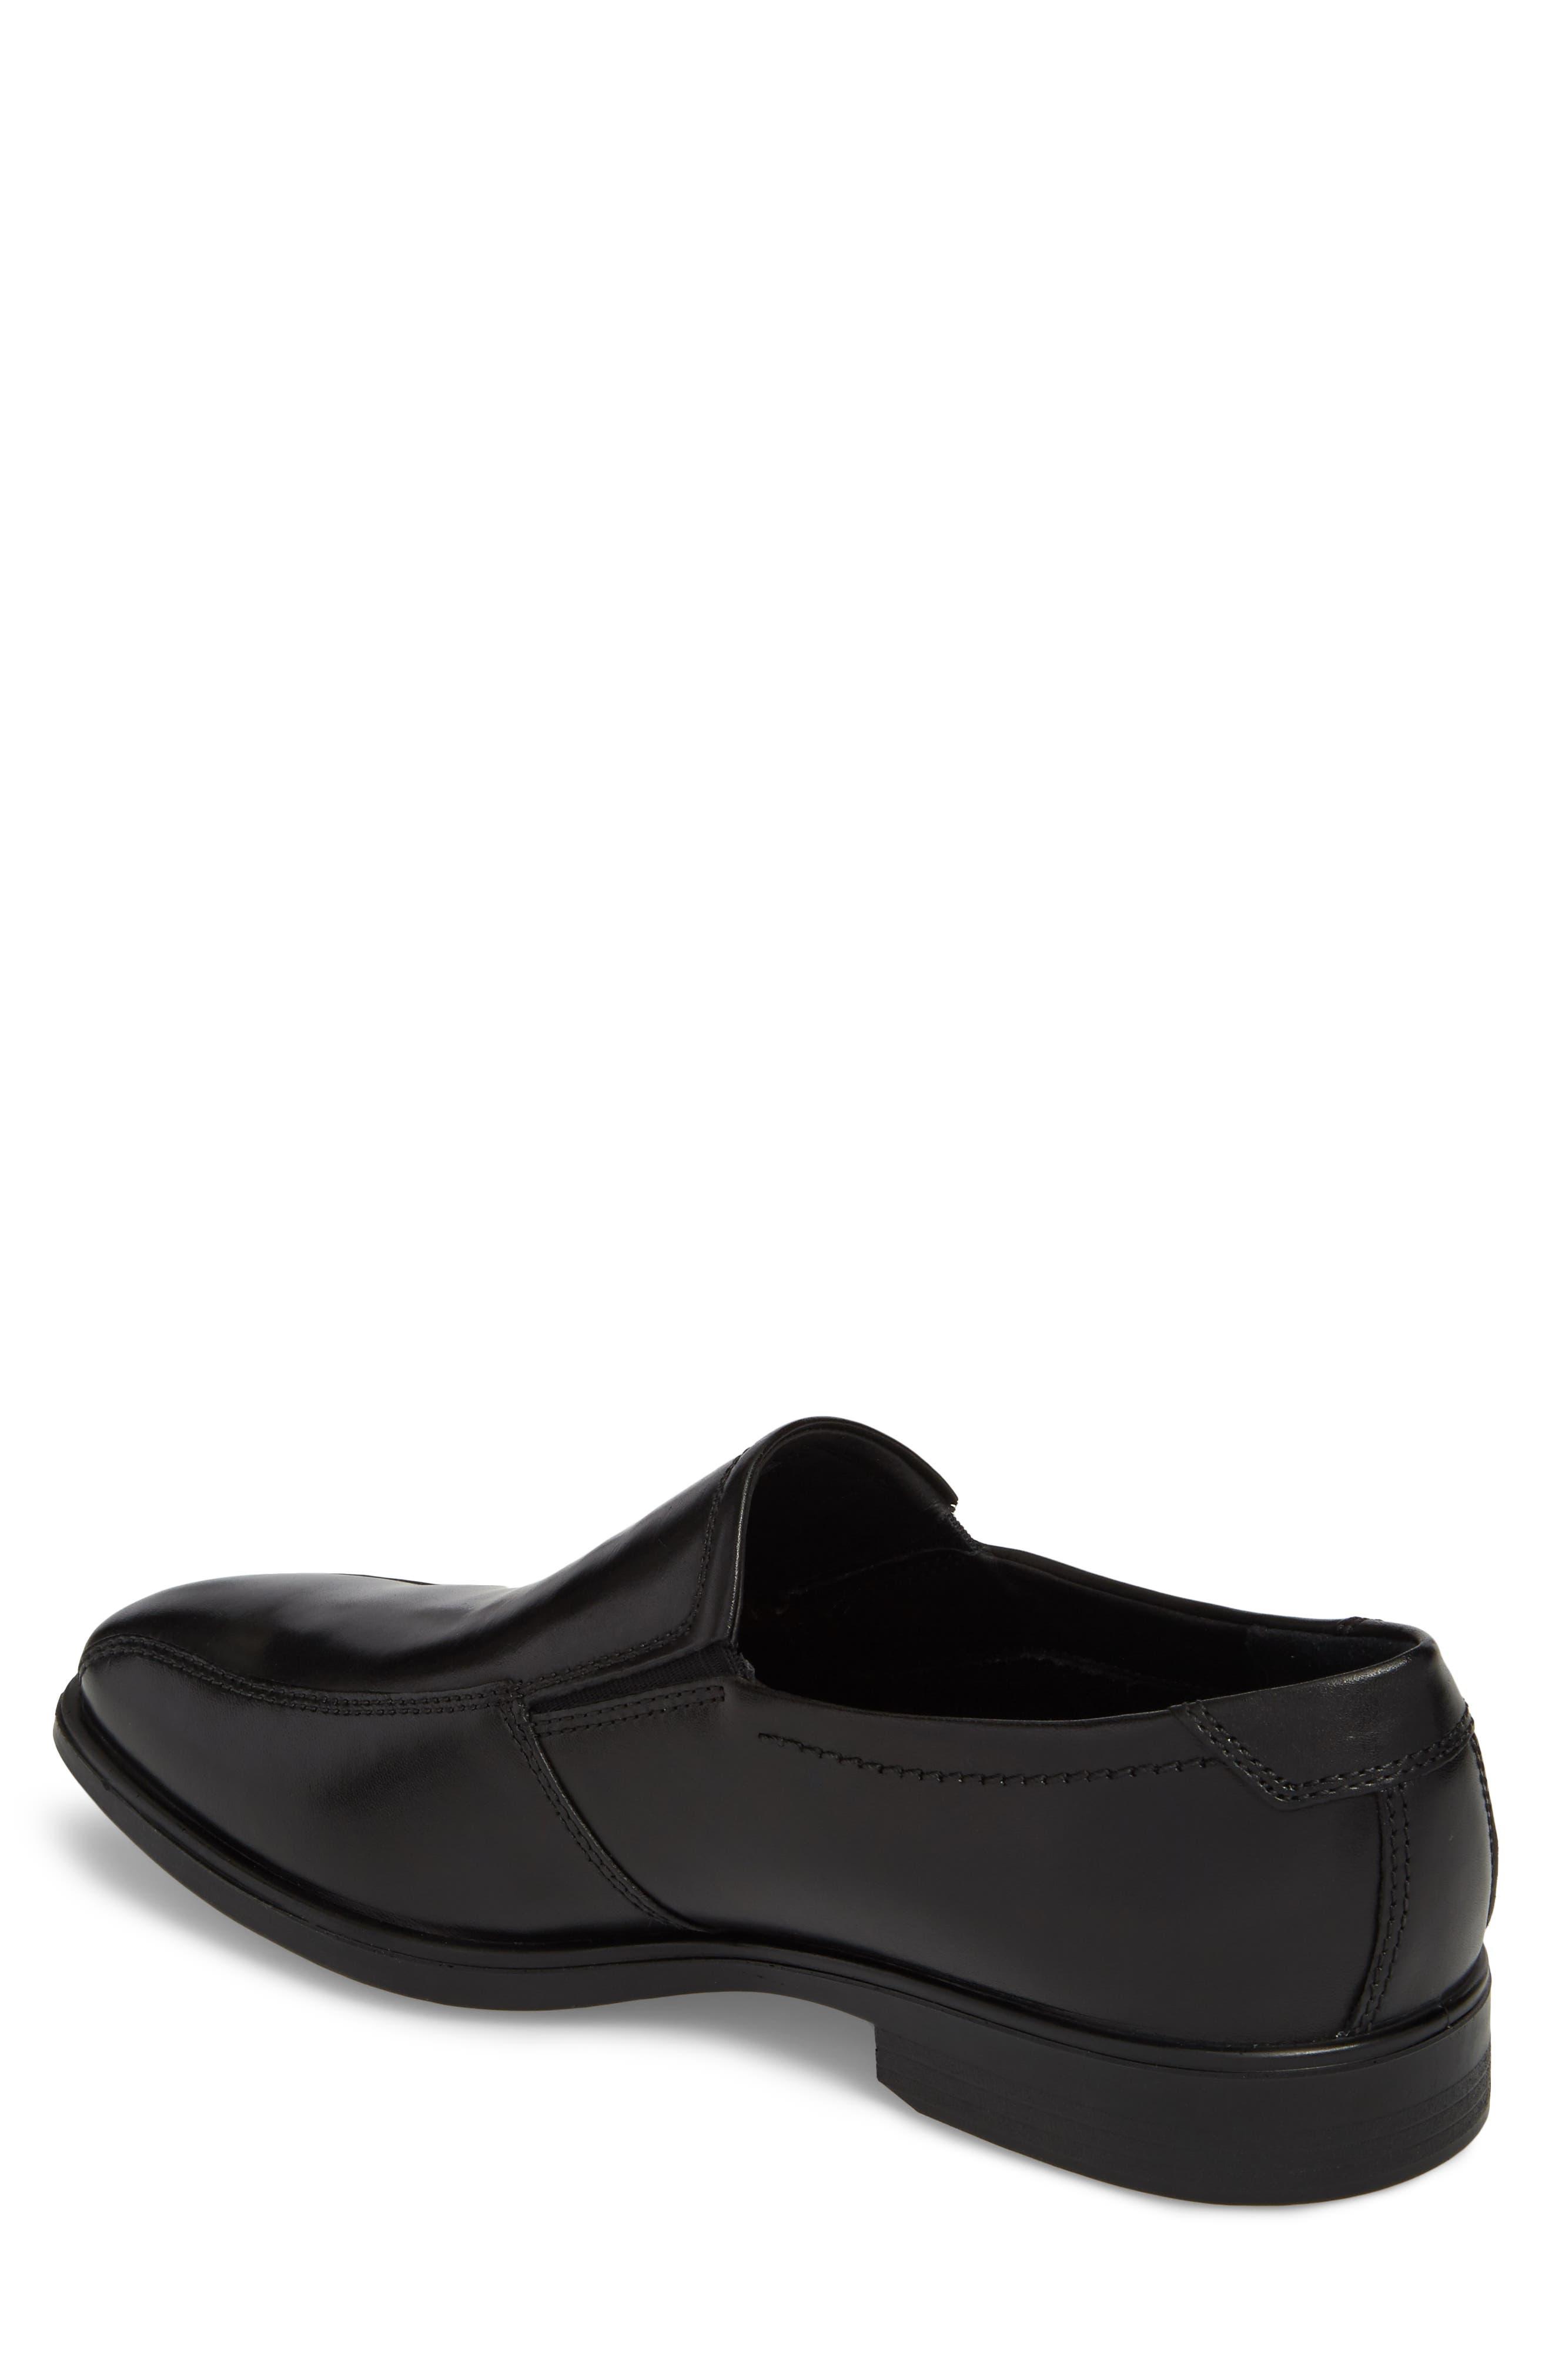 Melbourne Venetian Loafer,                             Alternate thumbnail 2, color,                             Black Leather